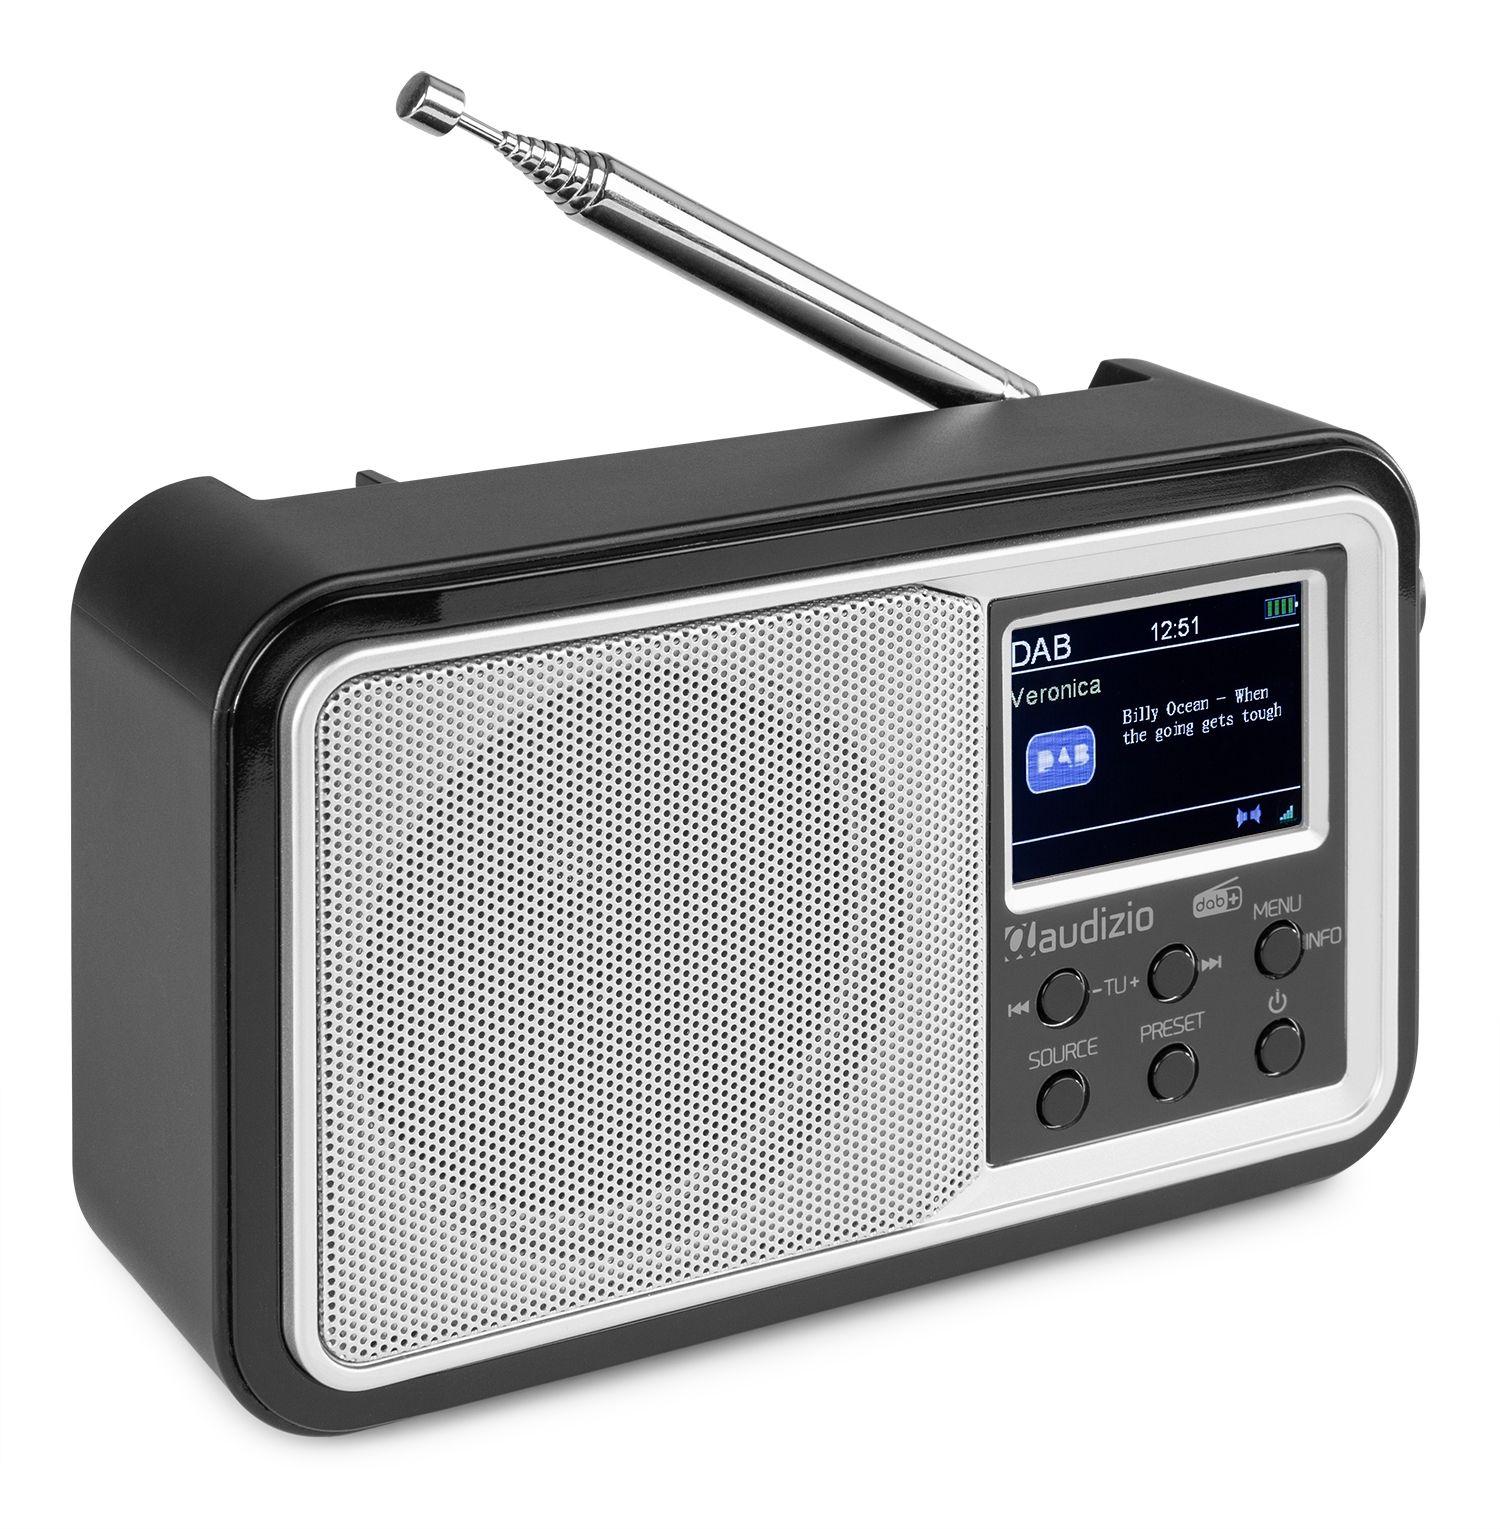 2e keus - Audizio Anzio draagbare DAB radio met Bluetooth, FM radio en